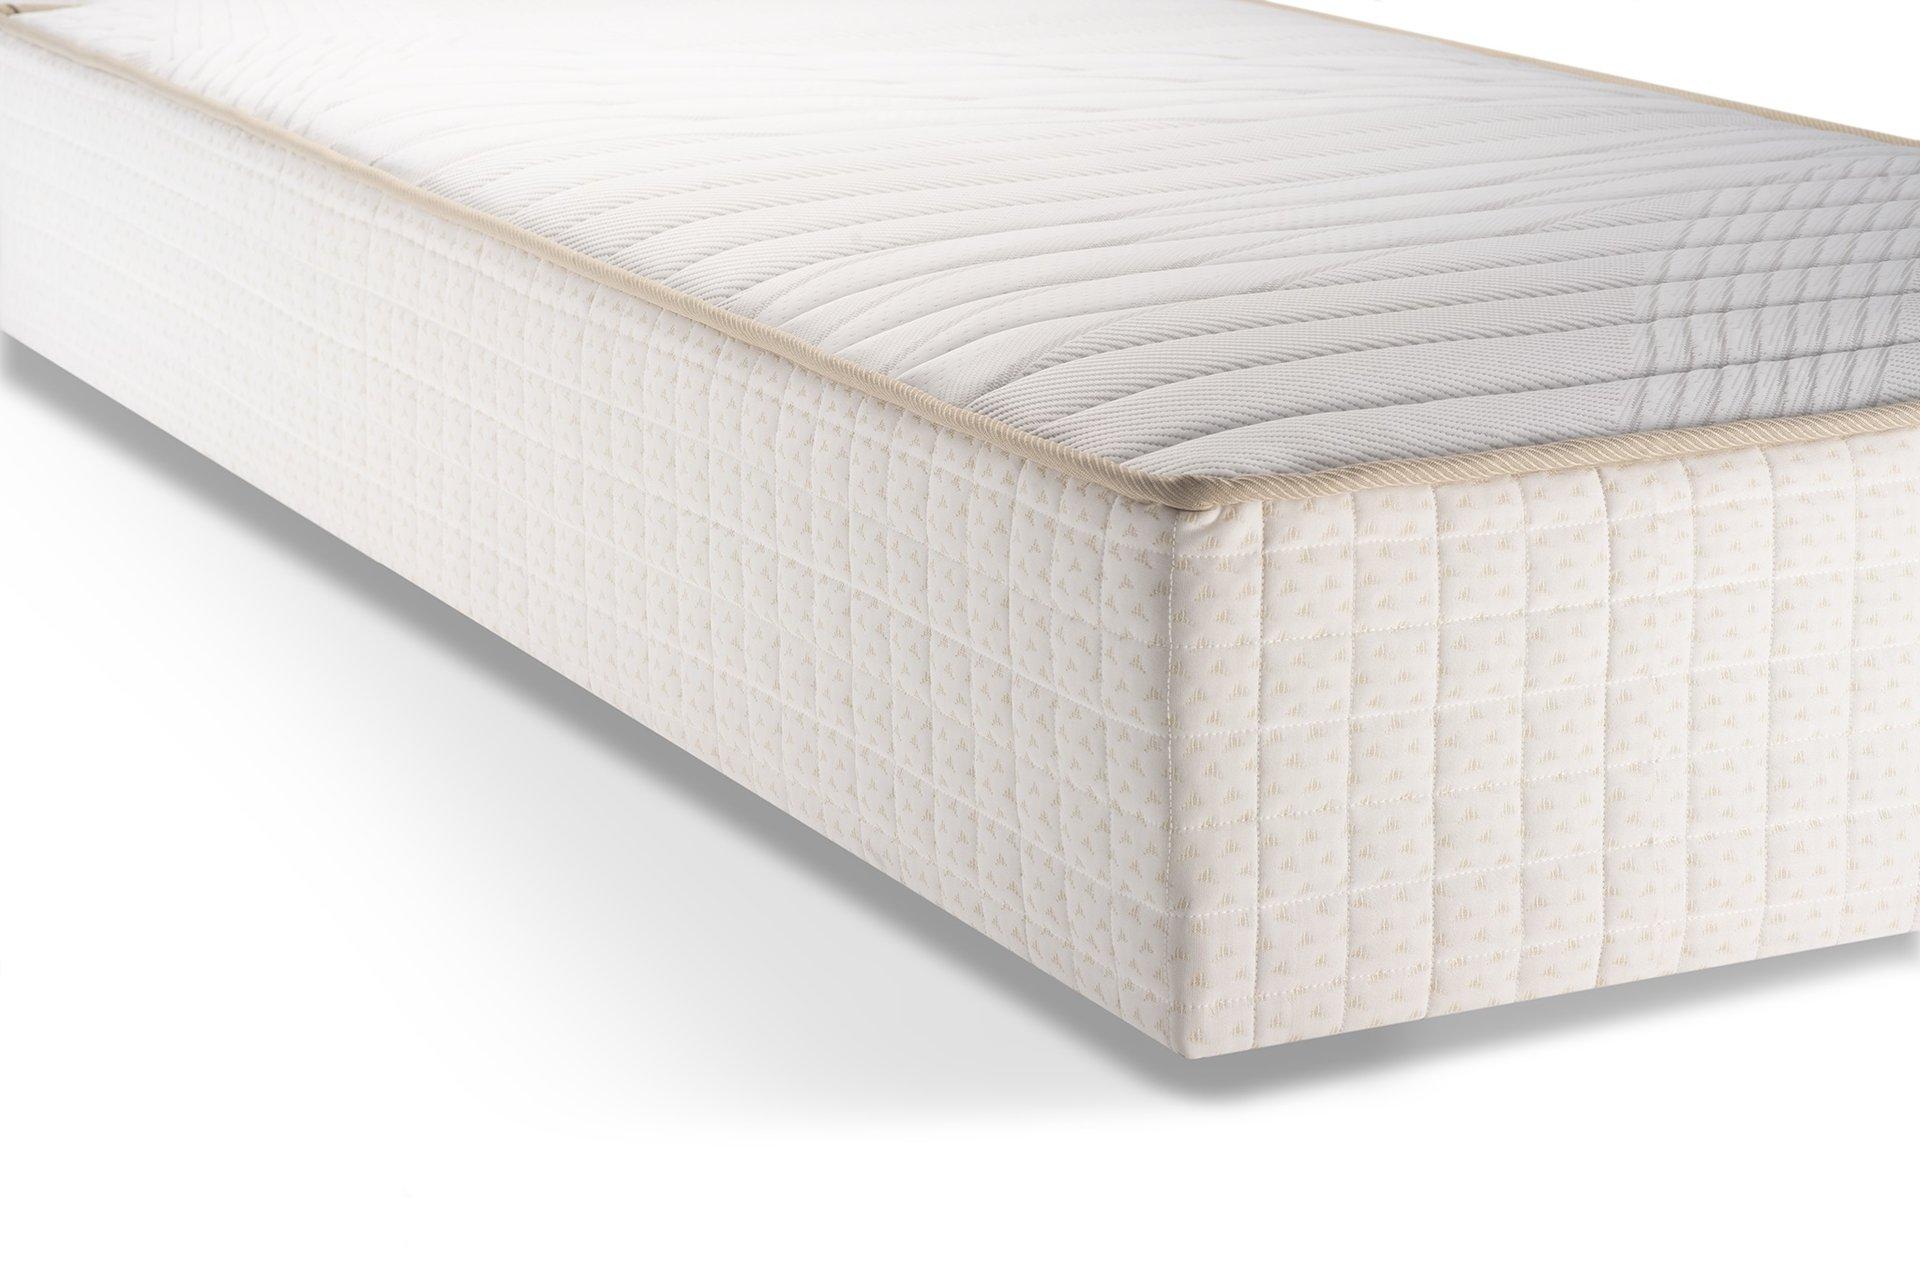 Ultimate Comfort 25 см, еднолицев мулти покет матрак